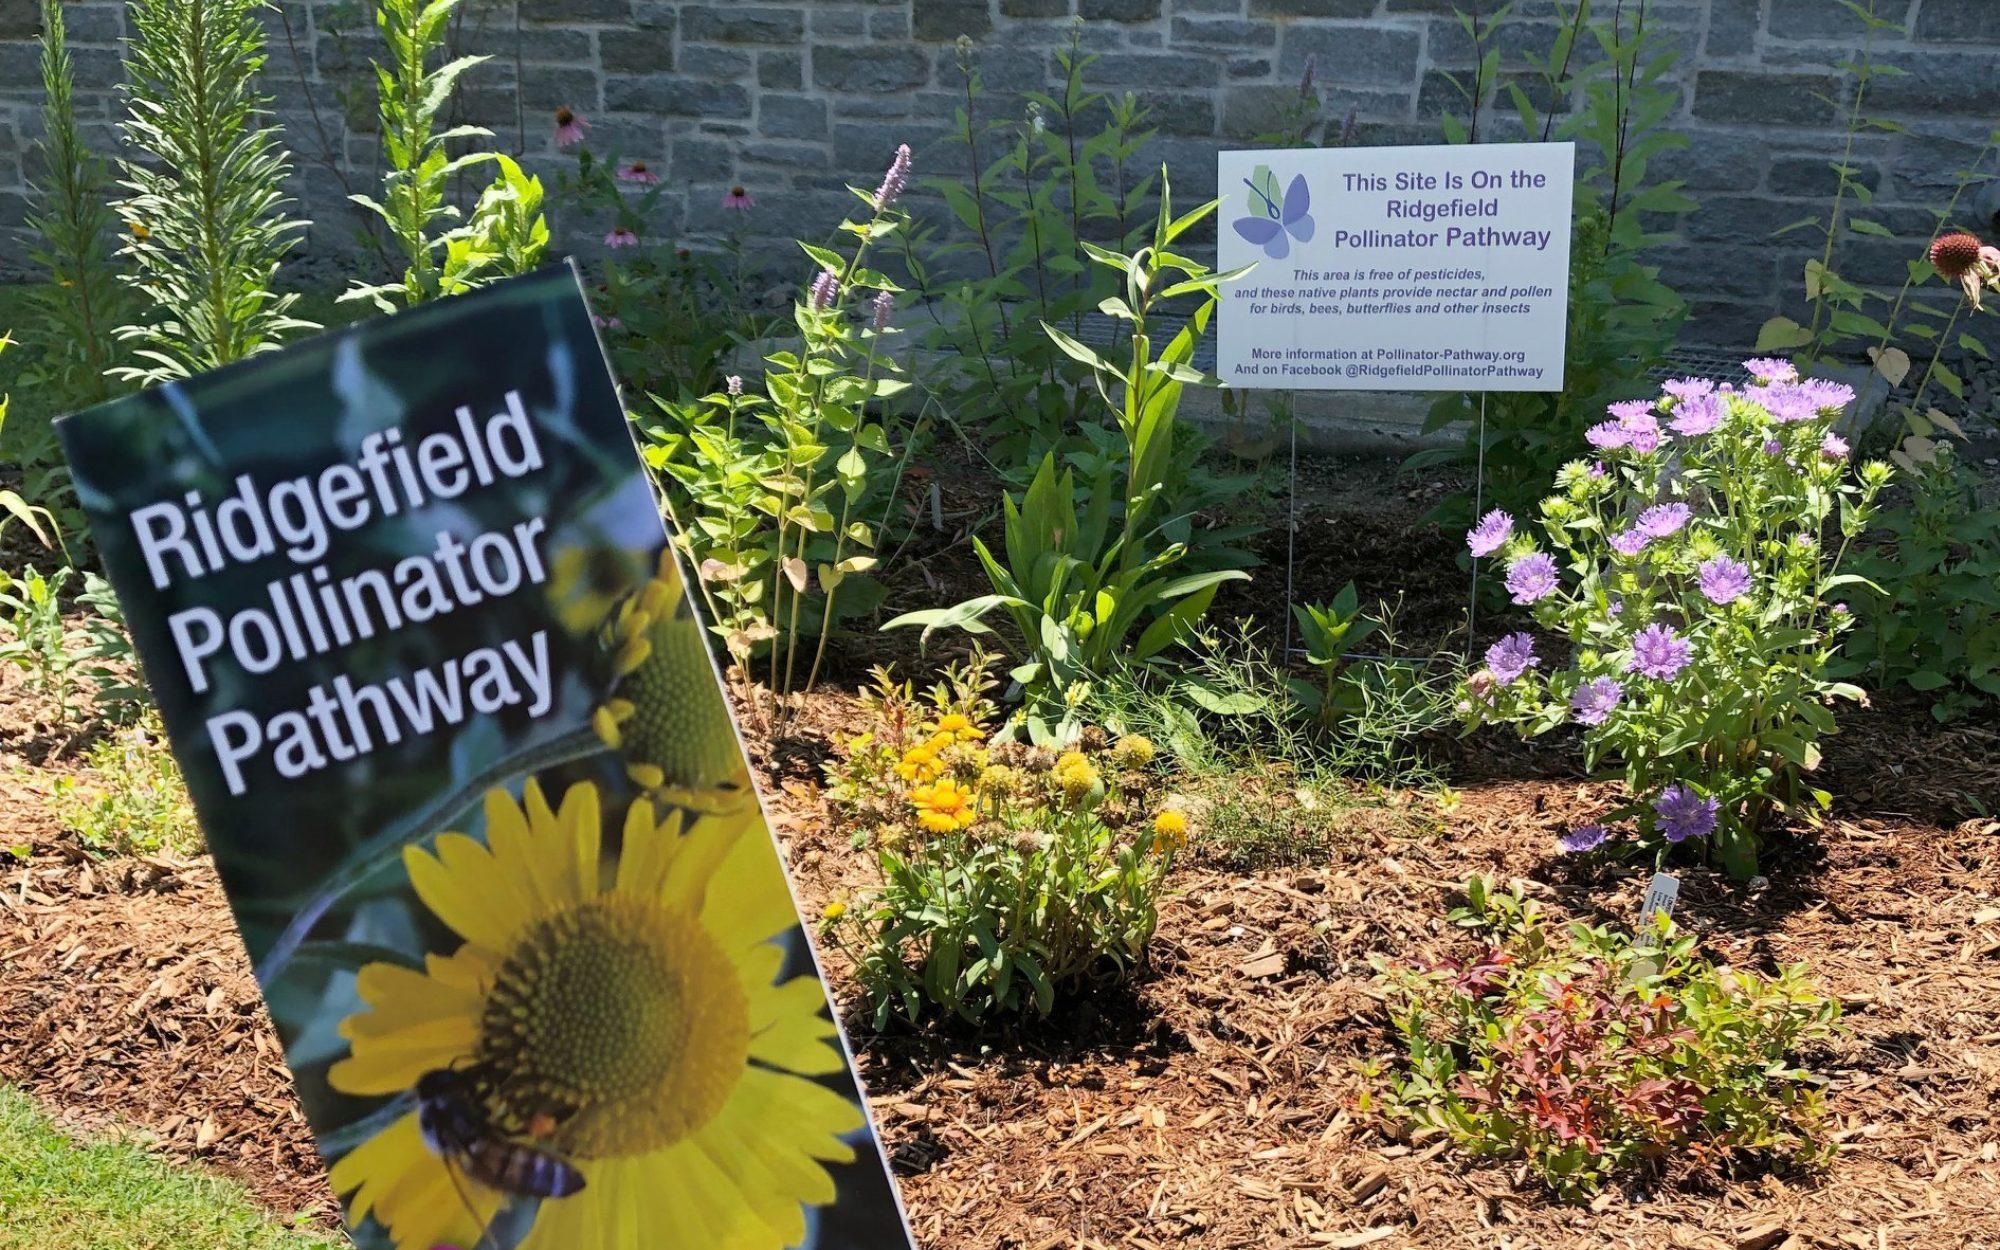 Ridgefield Pollinator Pathway